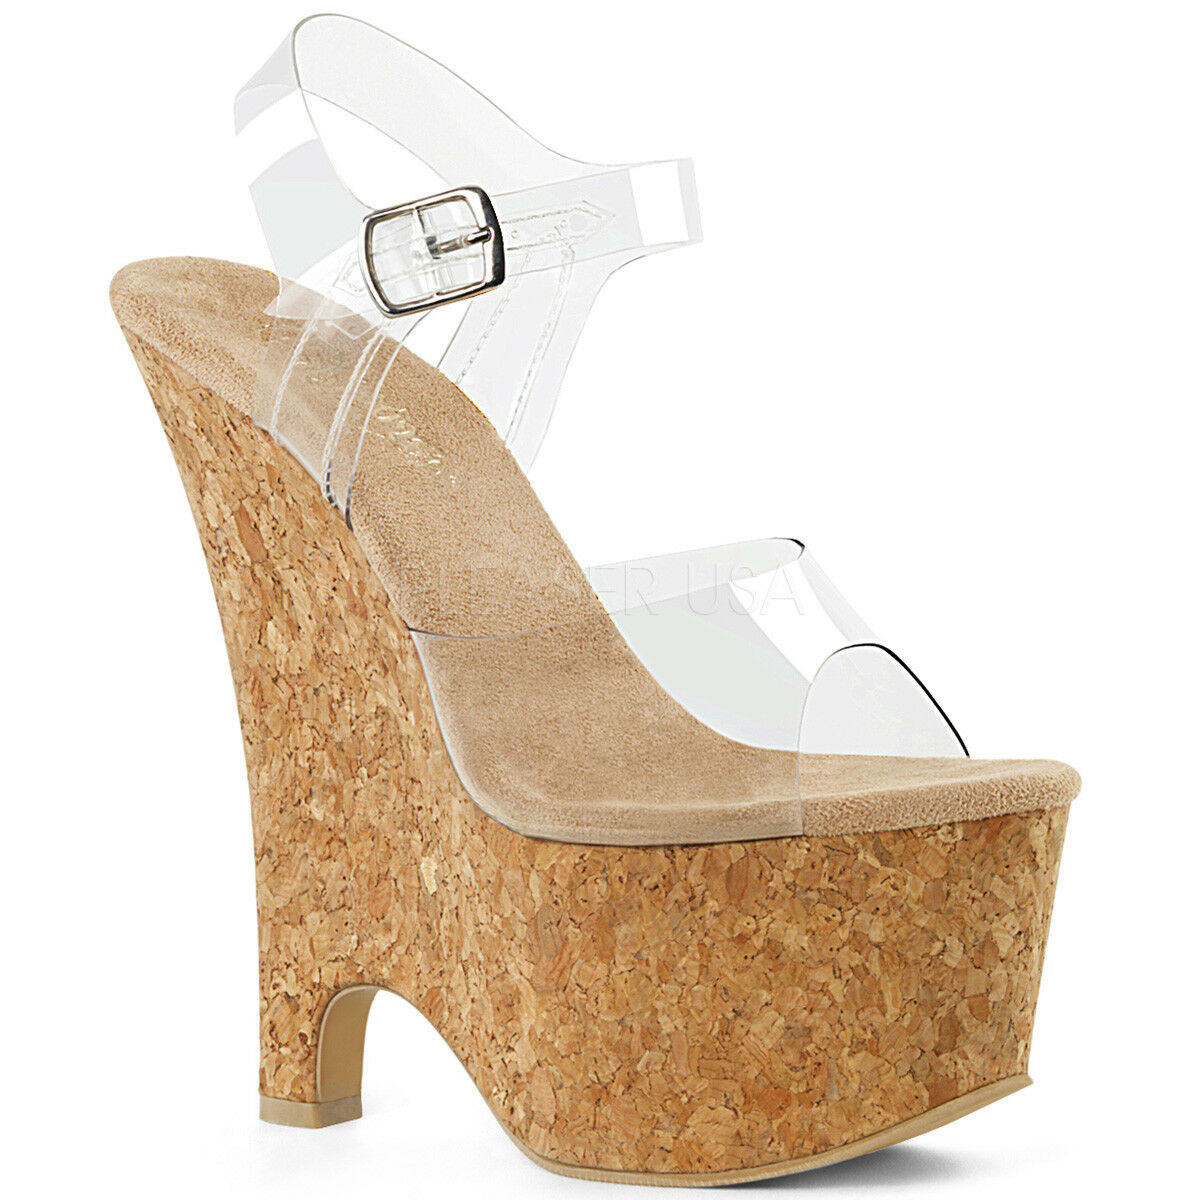 negozio online Pleaser Pleaser Pleaser BEAU-608 Donna  Clear Tan Cork Heel Wedge Platform Ankle Strap Sandals  centro commerciale online integrato professionale